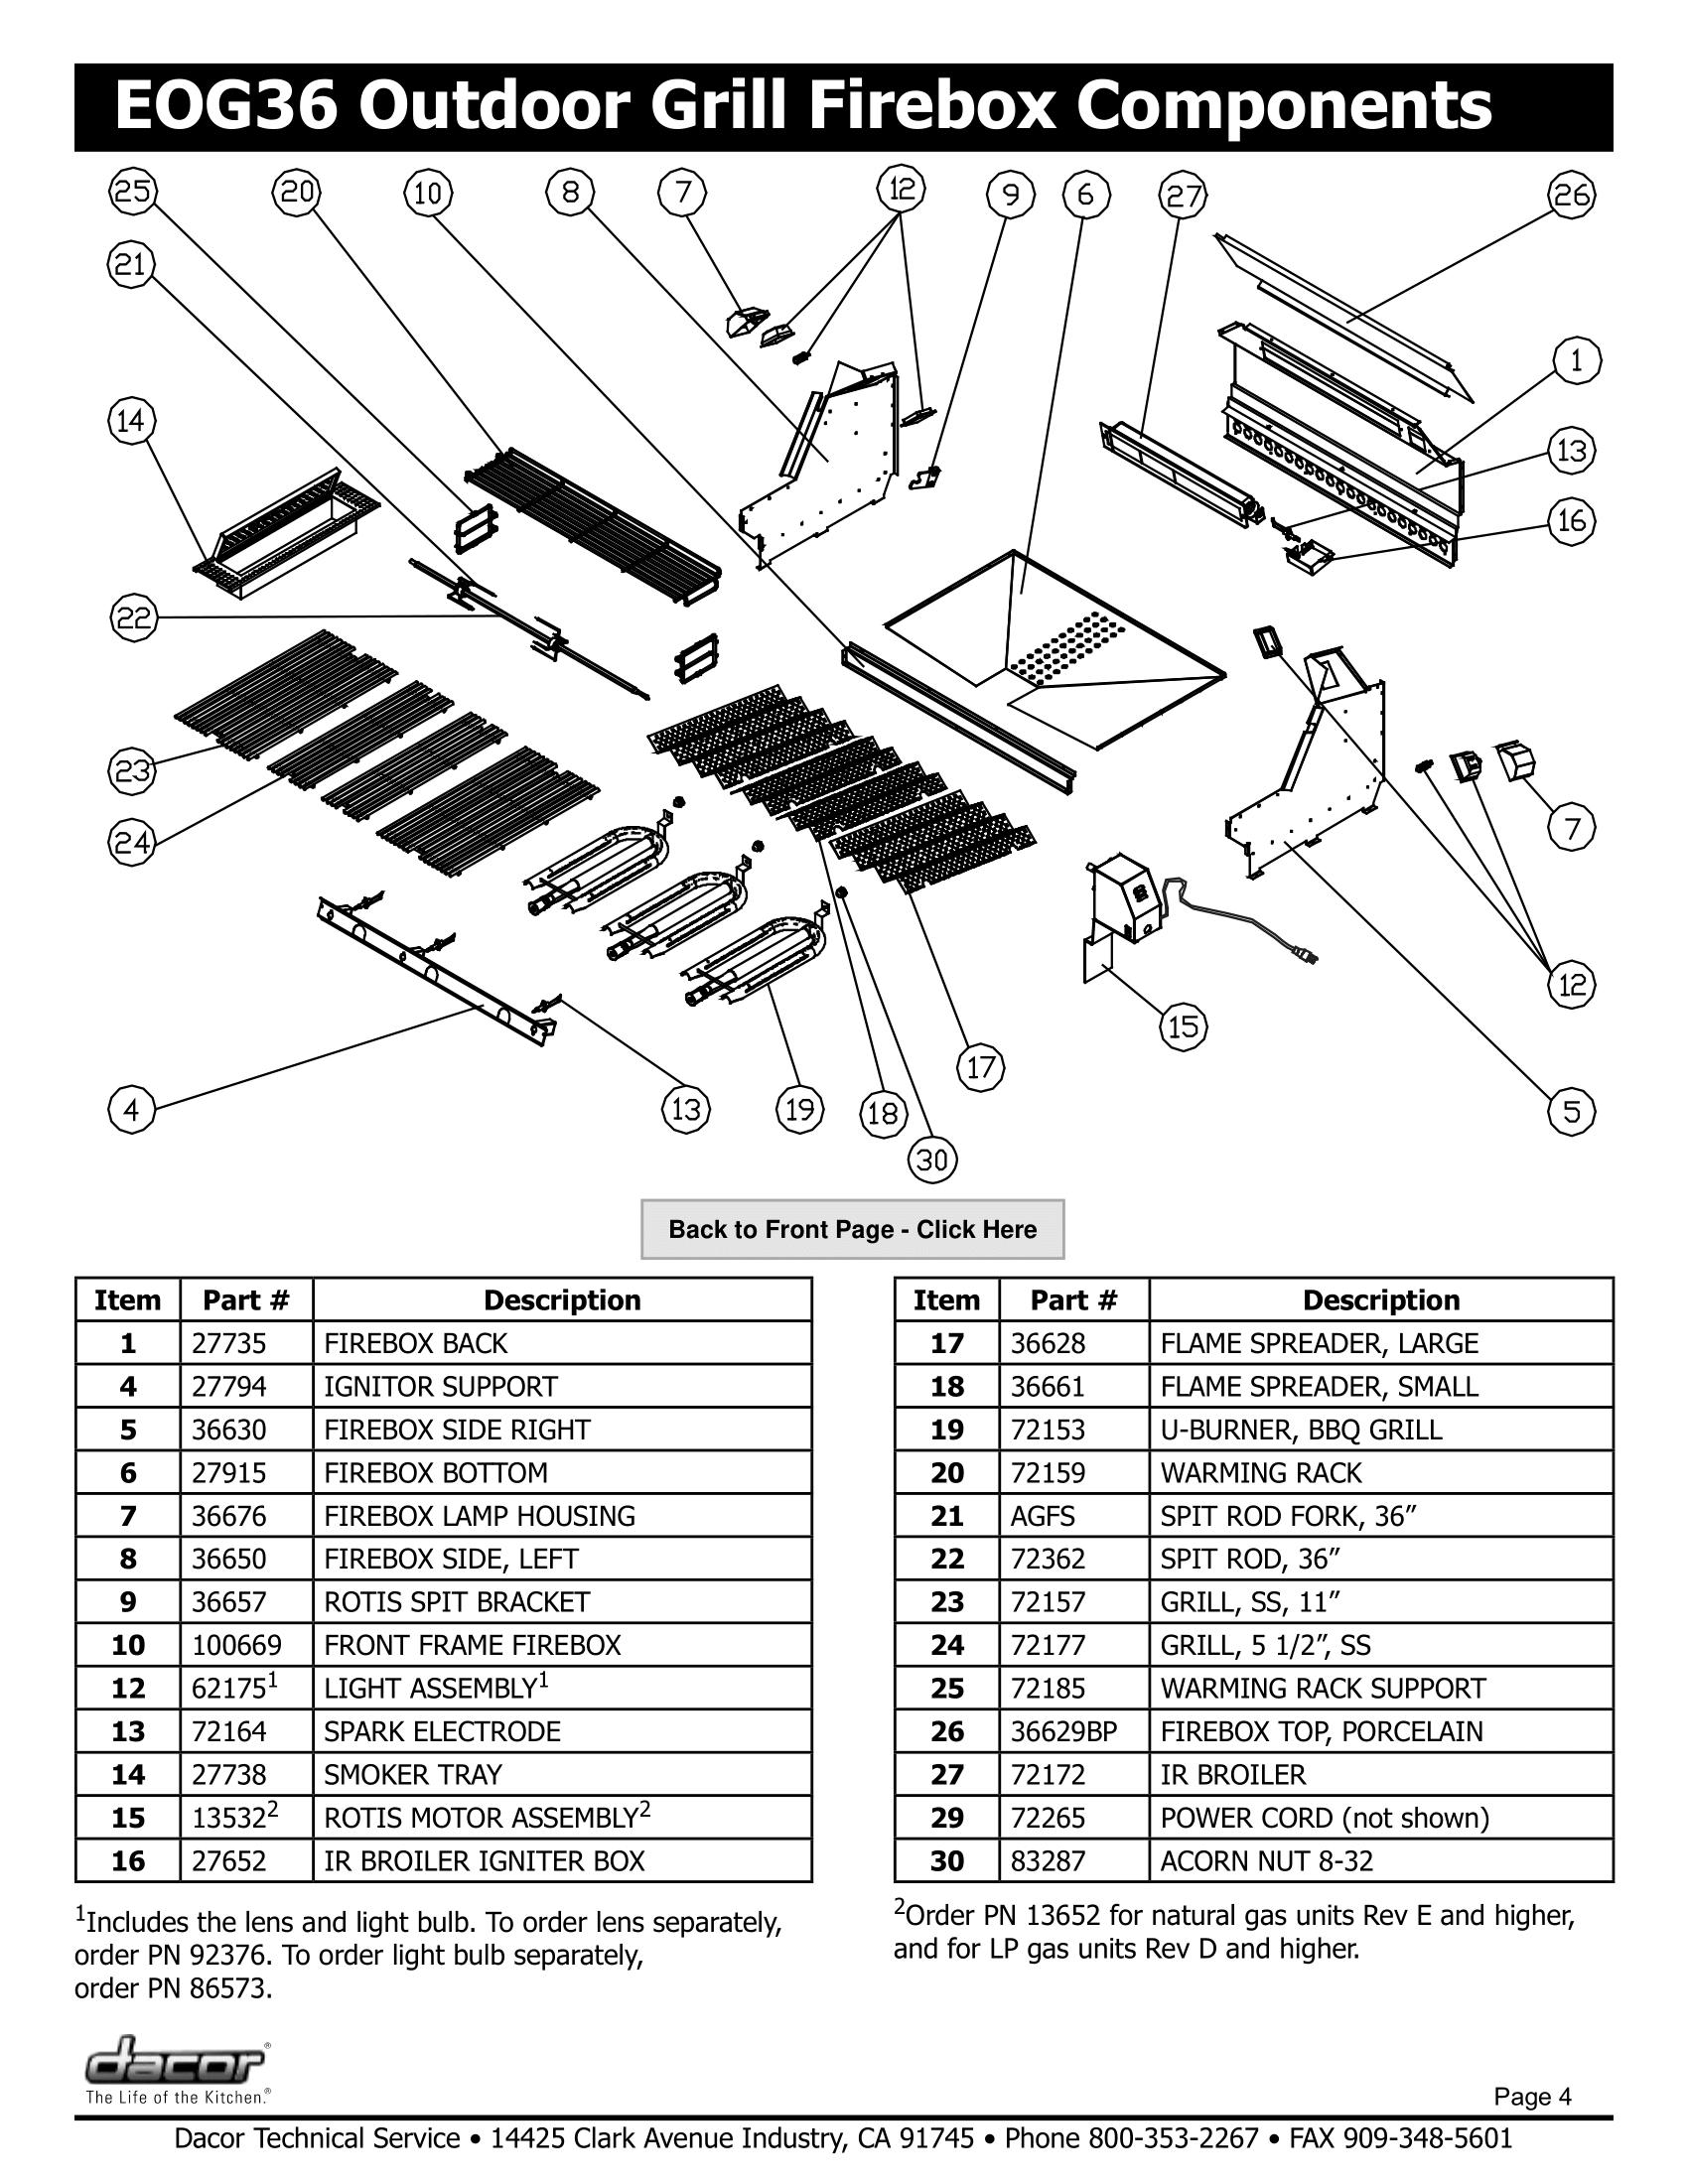 Dacor EOG36 Firebox Components Schematic